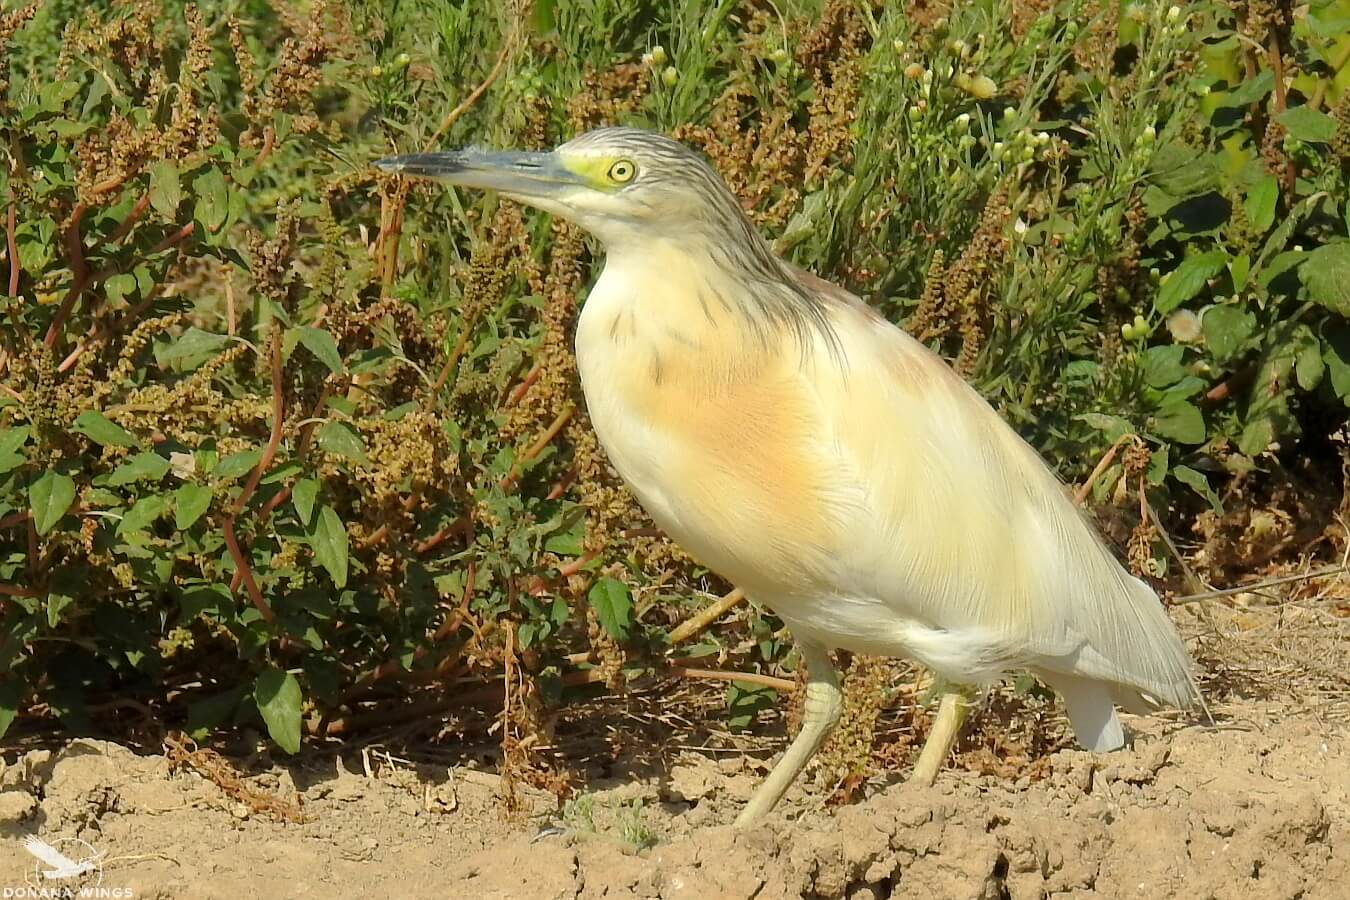 Squacco Heron / Garcilla cangrejera